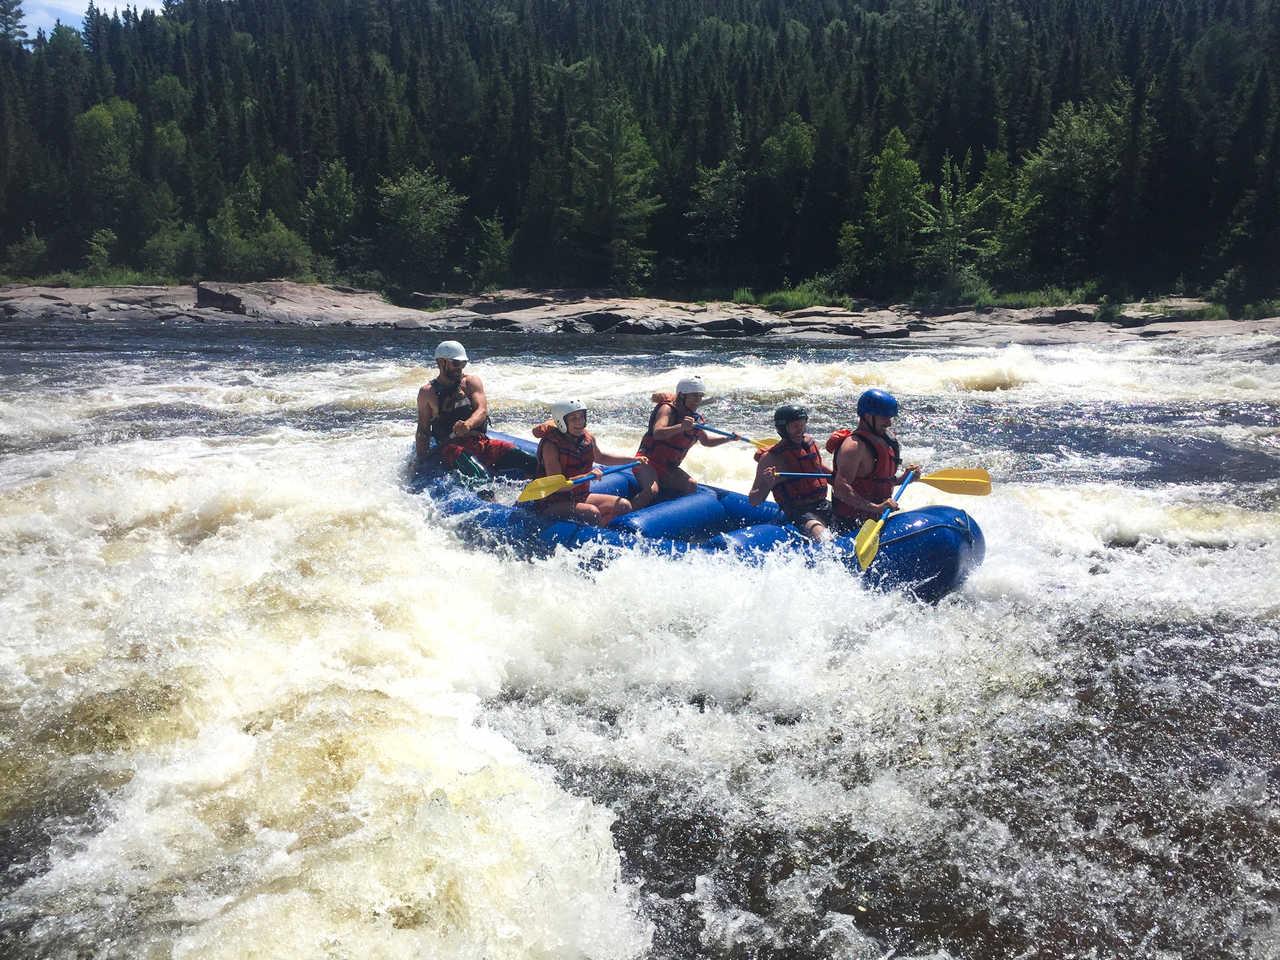 Rafting sur la rivière Mattawin au Québec, Canada